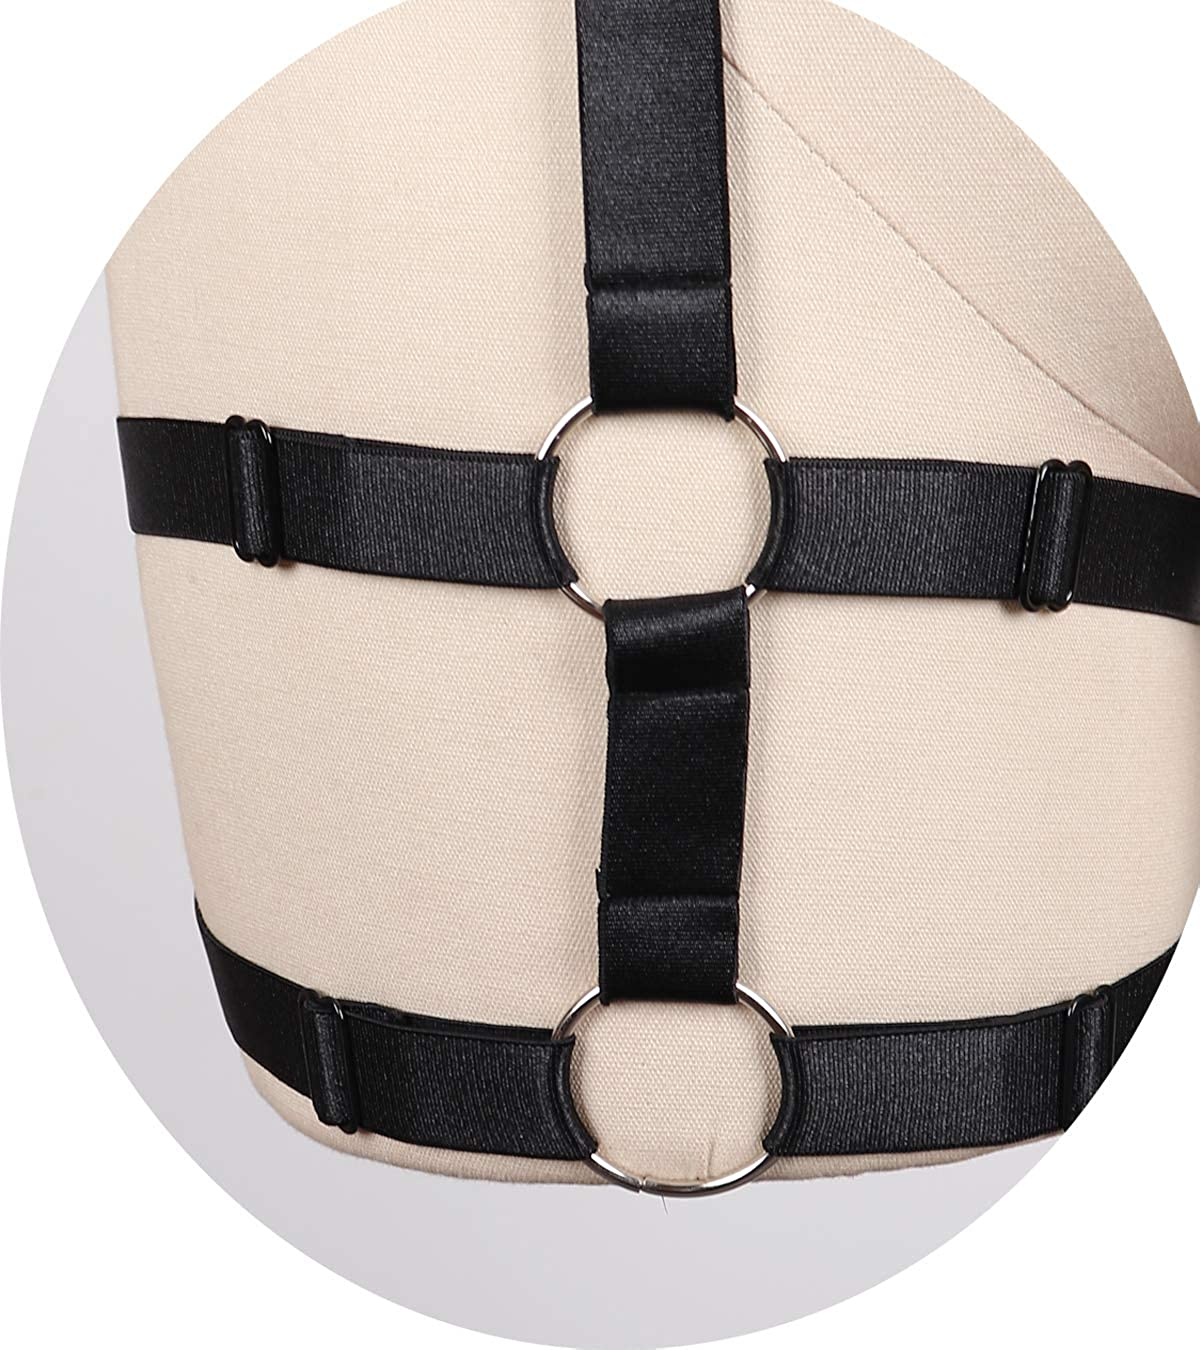 Style-8 HJZLSSYS Womens Leg Garter Harness Bra Gothic Garter Belt Strappy Cage Bra Plus Size for Women